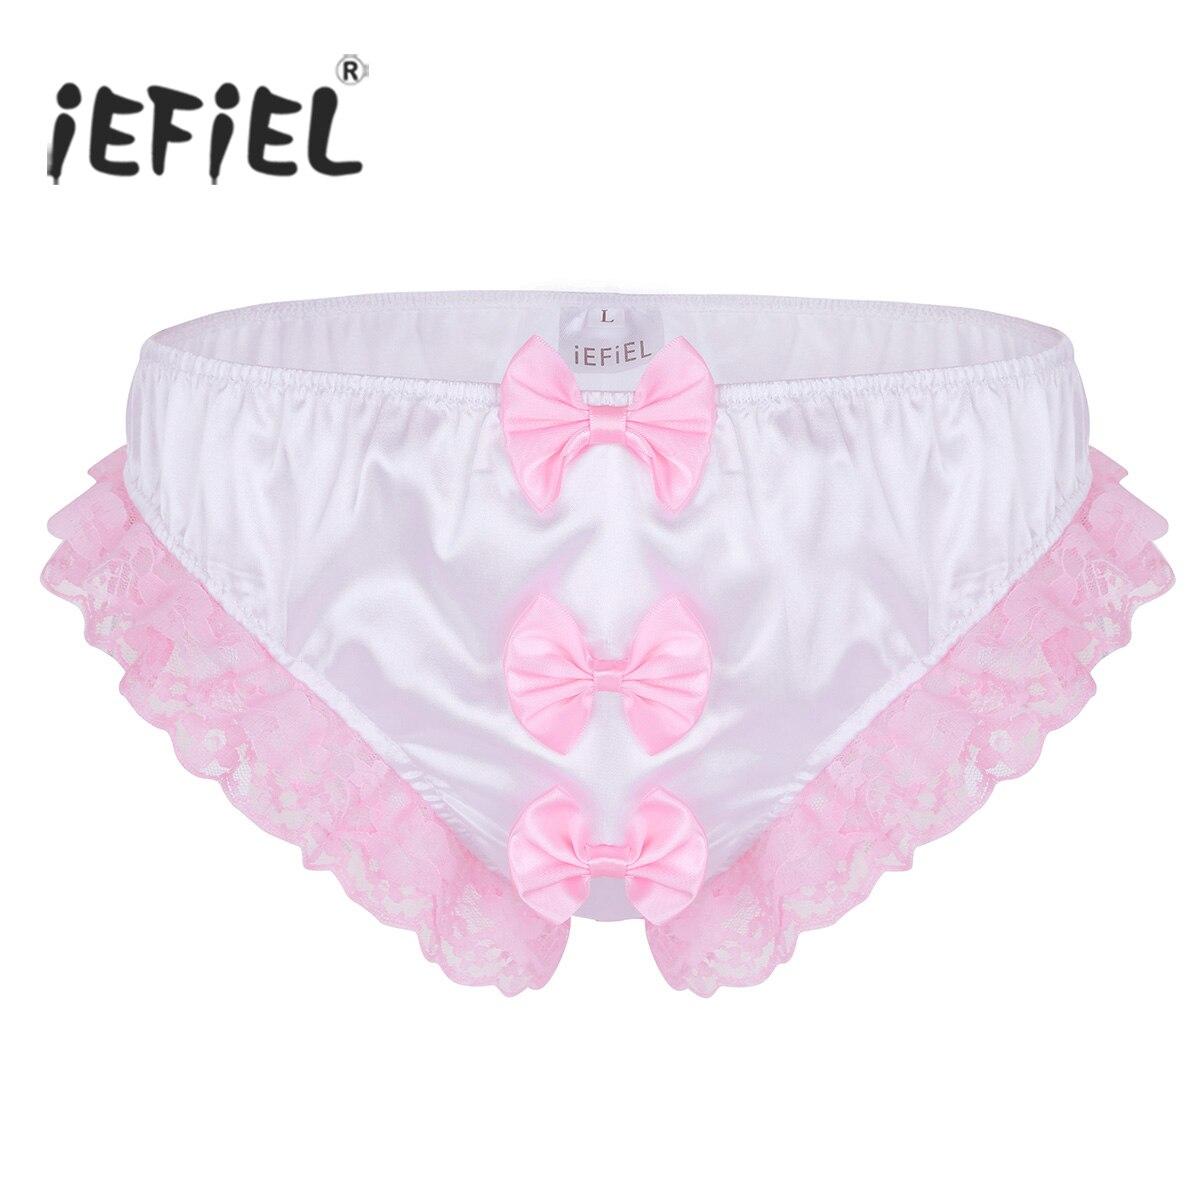 Women Floral Lace Panties Briefs Bikini Panty Shorts Underwear Underpants Gift